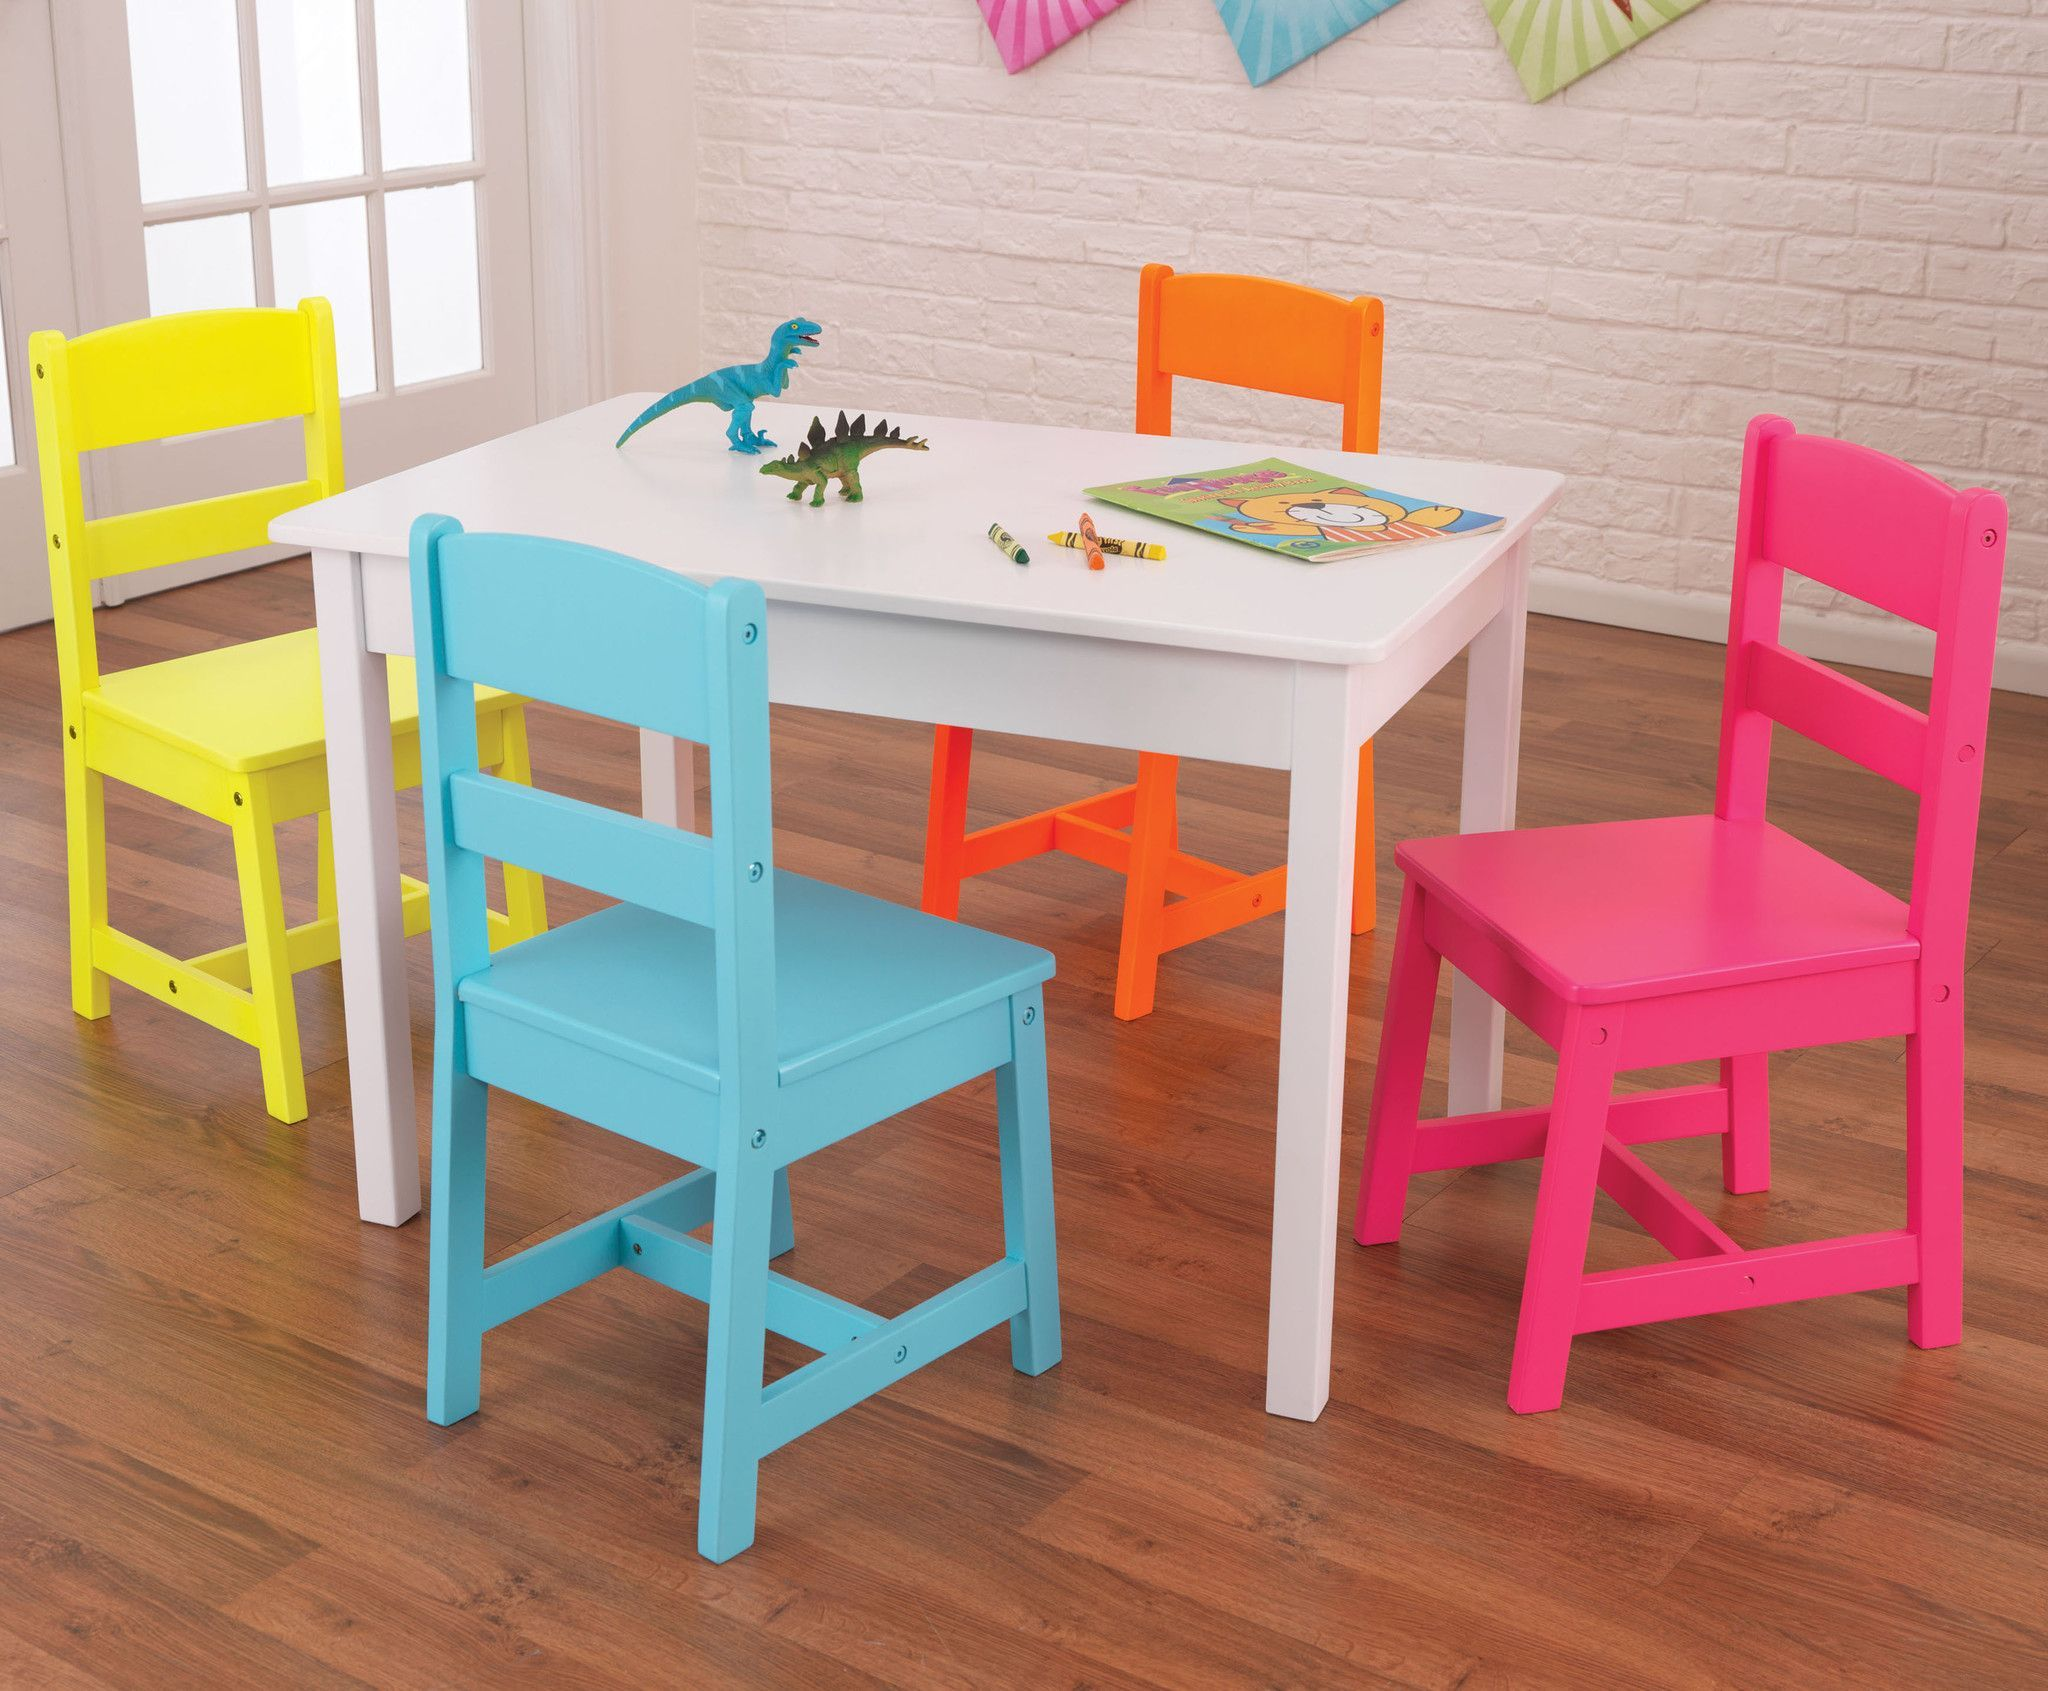 KidKraft Highlighter Table & 4 Chair Set - 26324 $175 The Kidkraft ...